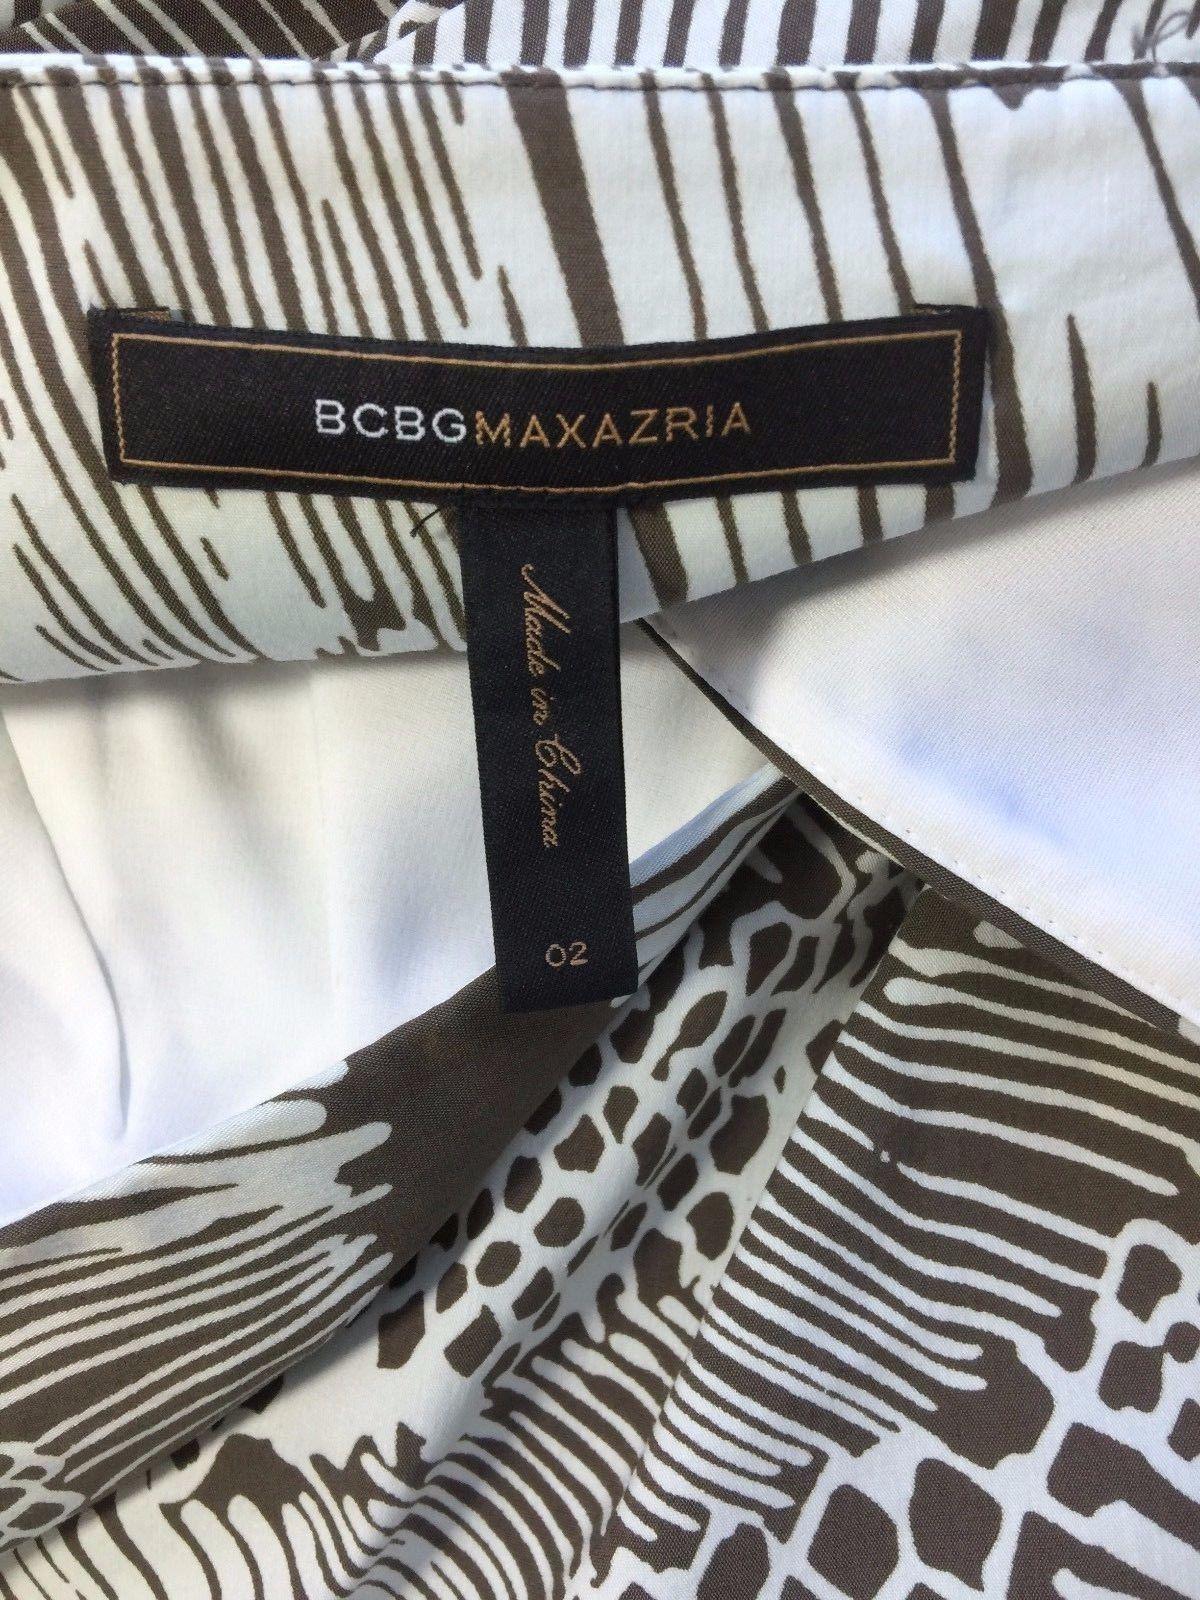 NEW BCBG Max Azria sz 2 Small Cocoa Brown Combo empire pleat pocket dress party